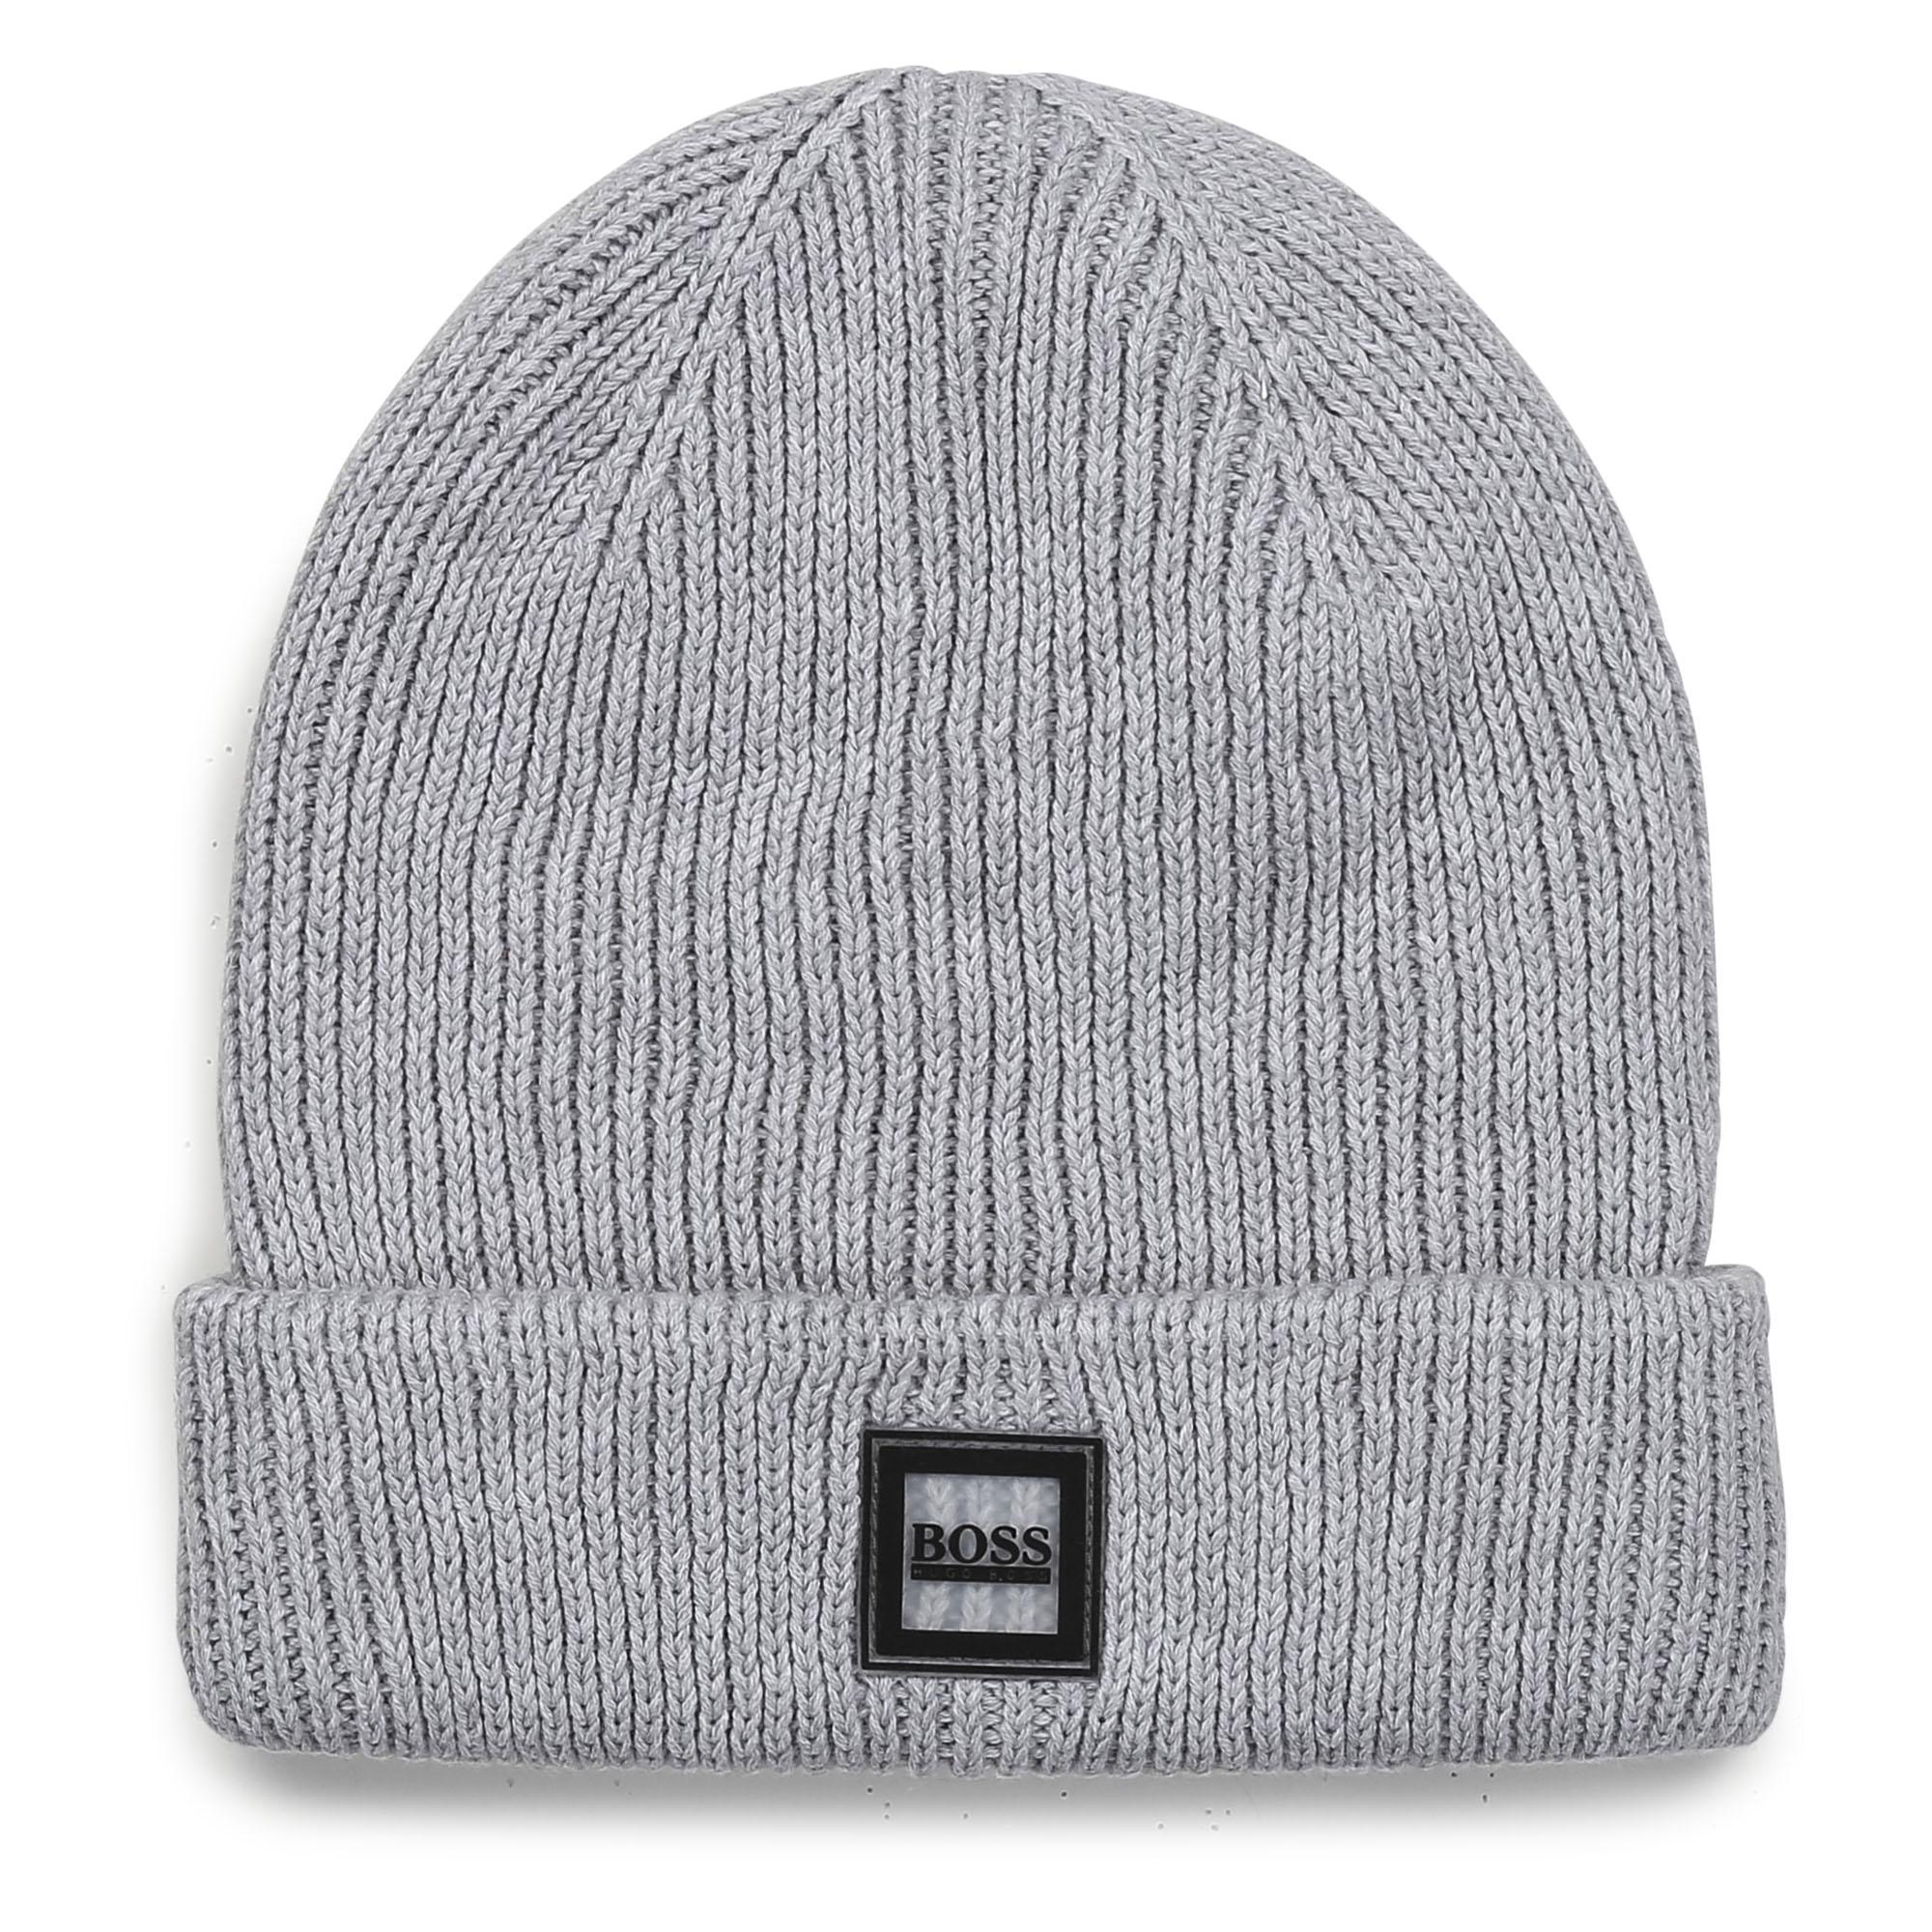 1x1 rib knit hat BOSS for BOY